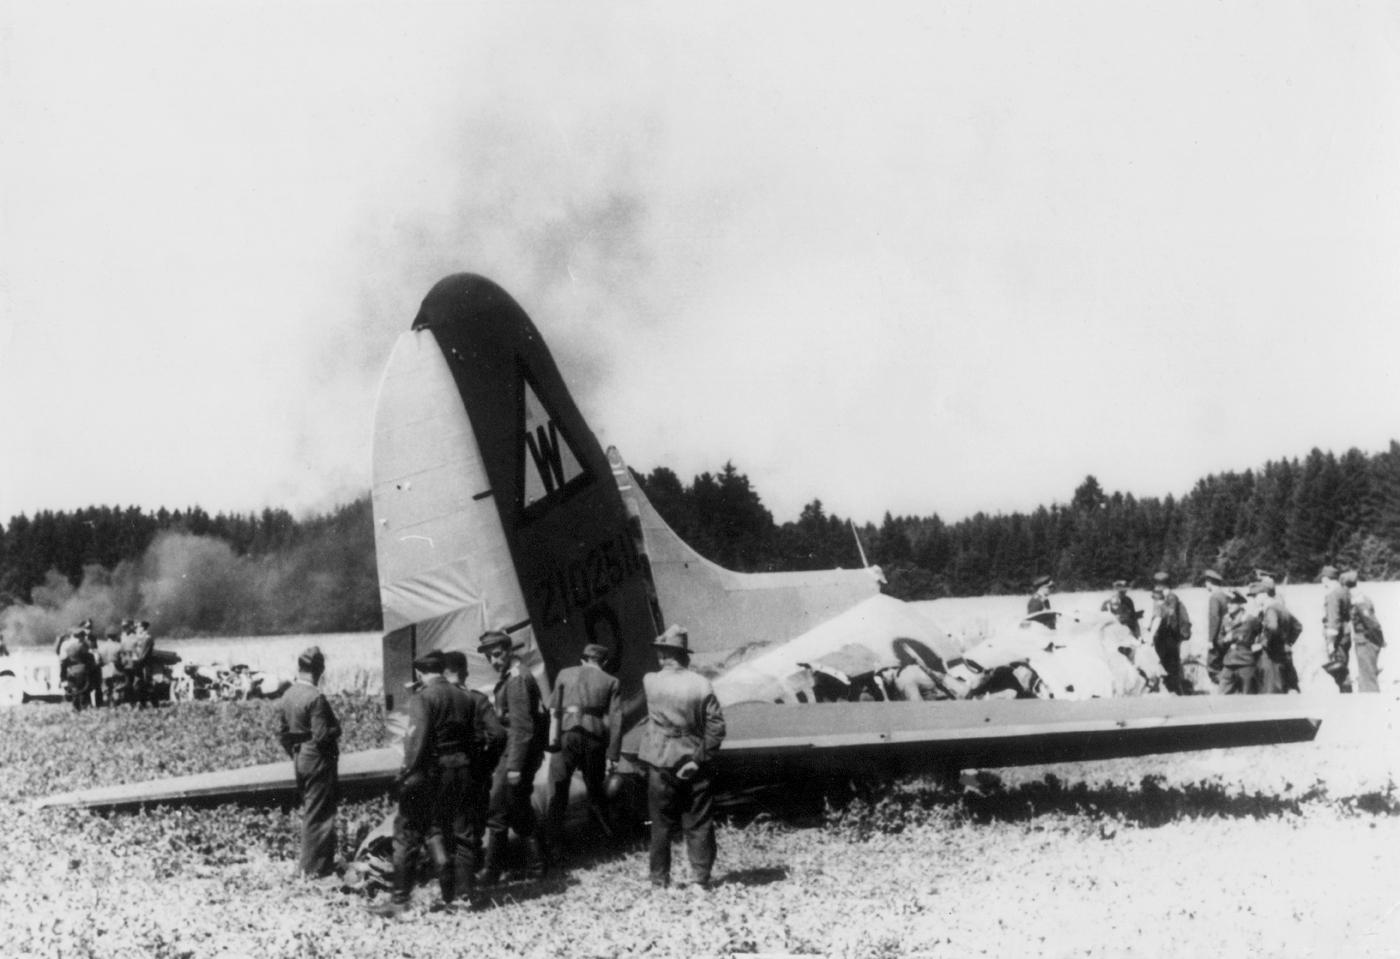 B-17 #42-102511